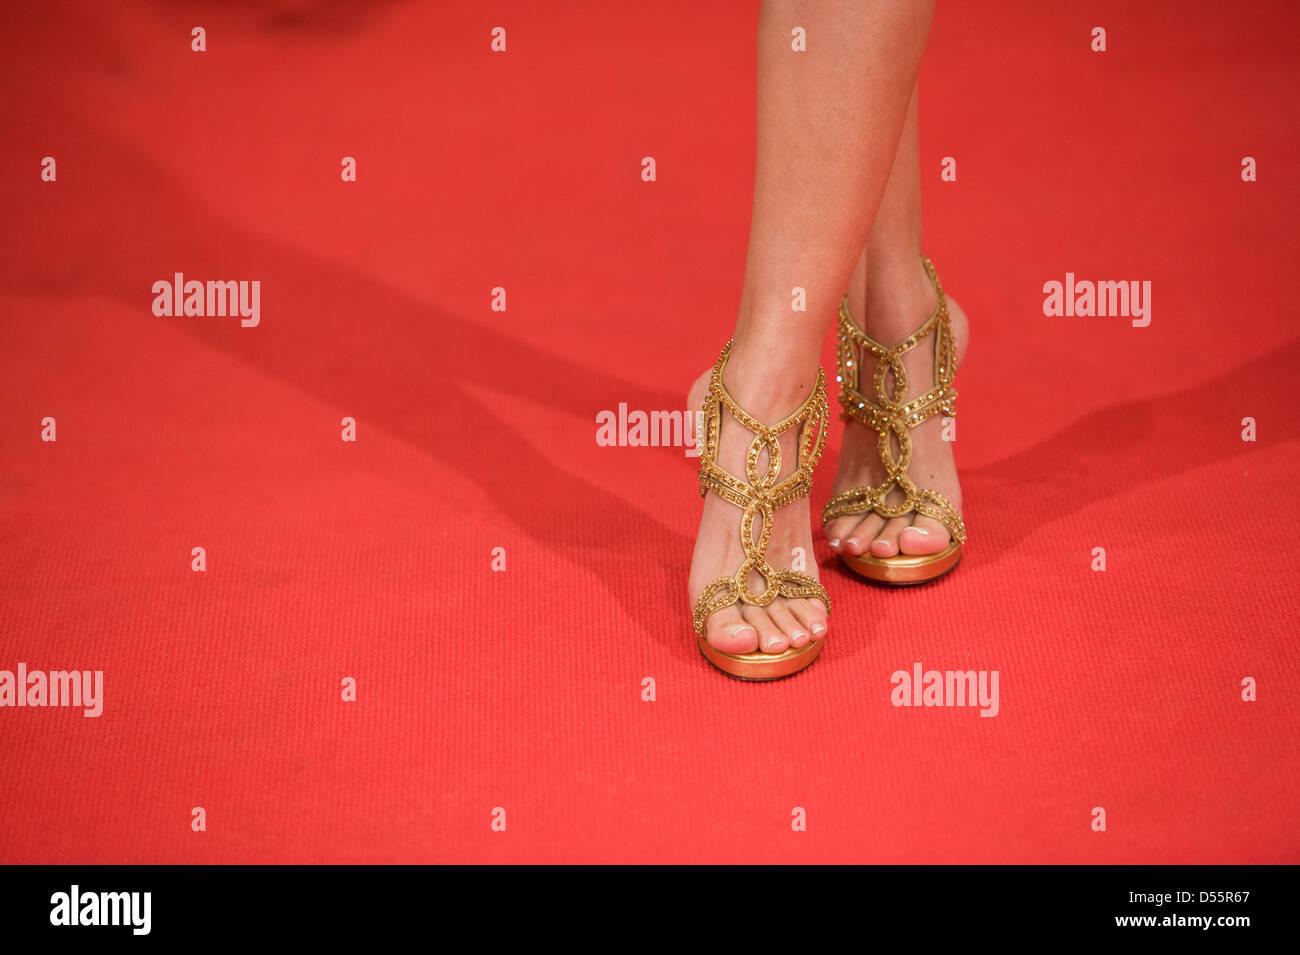 Feet Adele Haenel nude (32 photos), Pussy, Sideboobs, Twitter, lingerie 2020